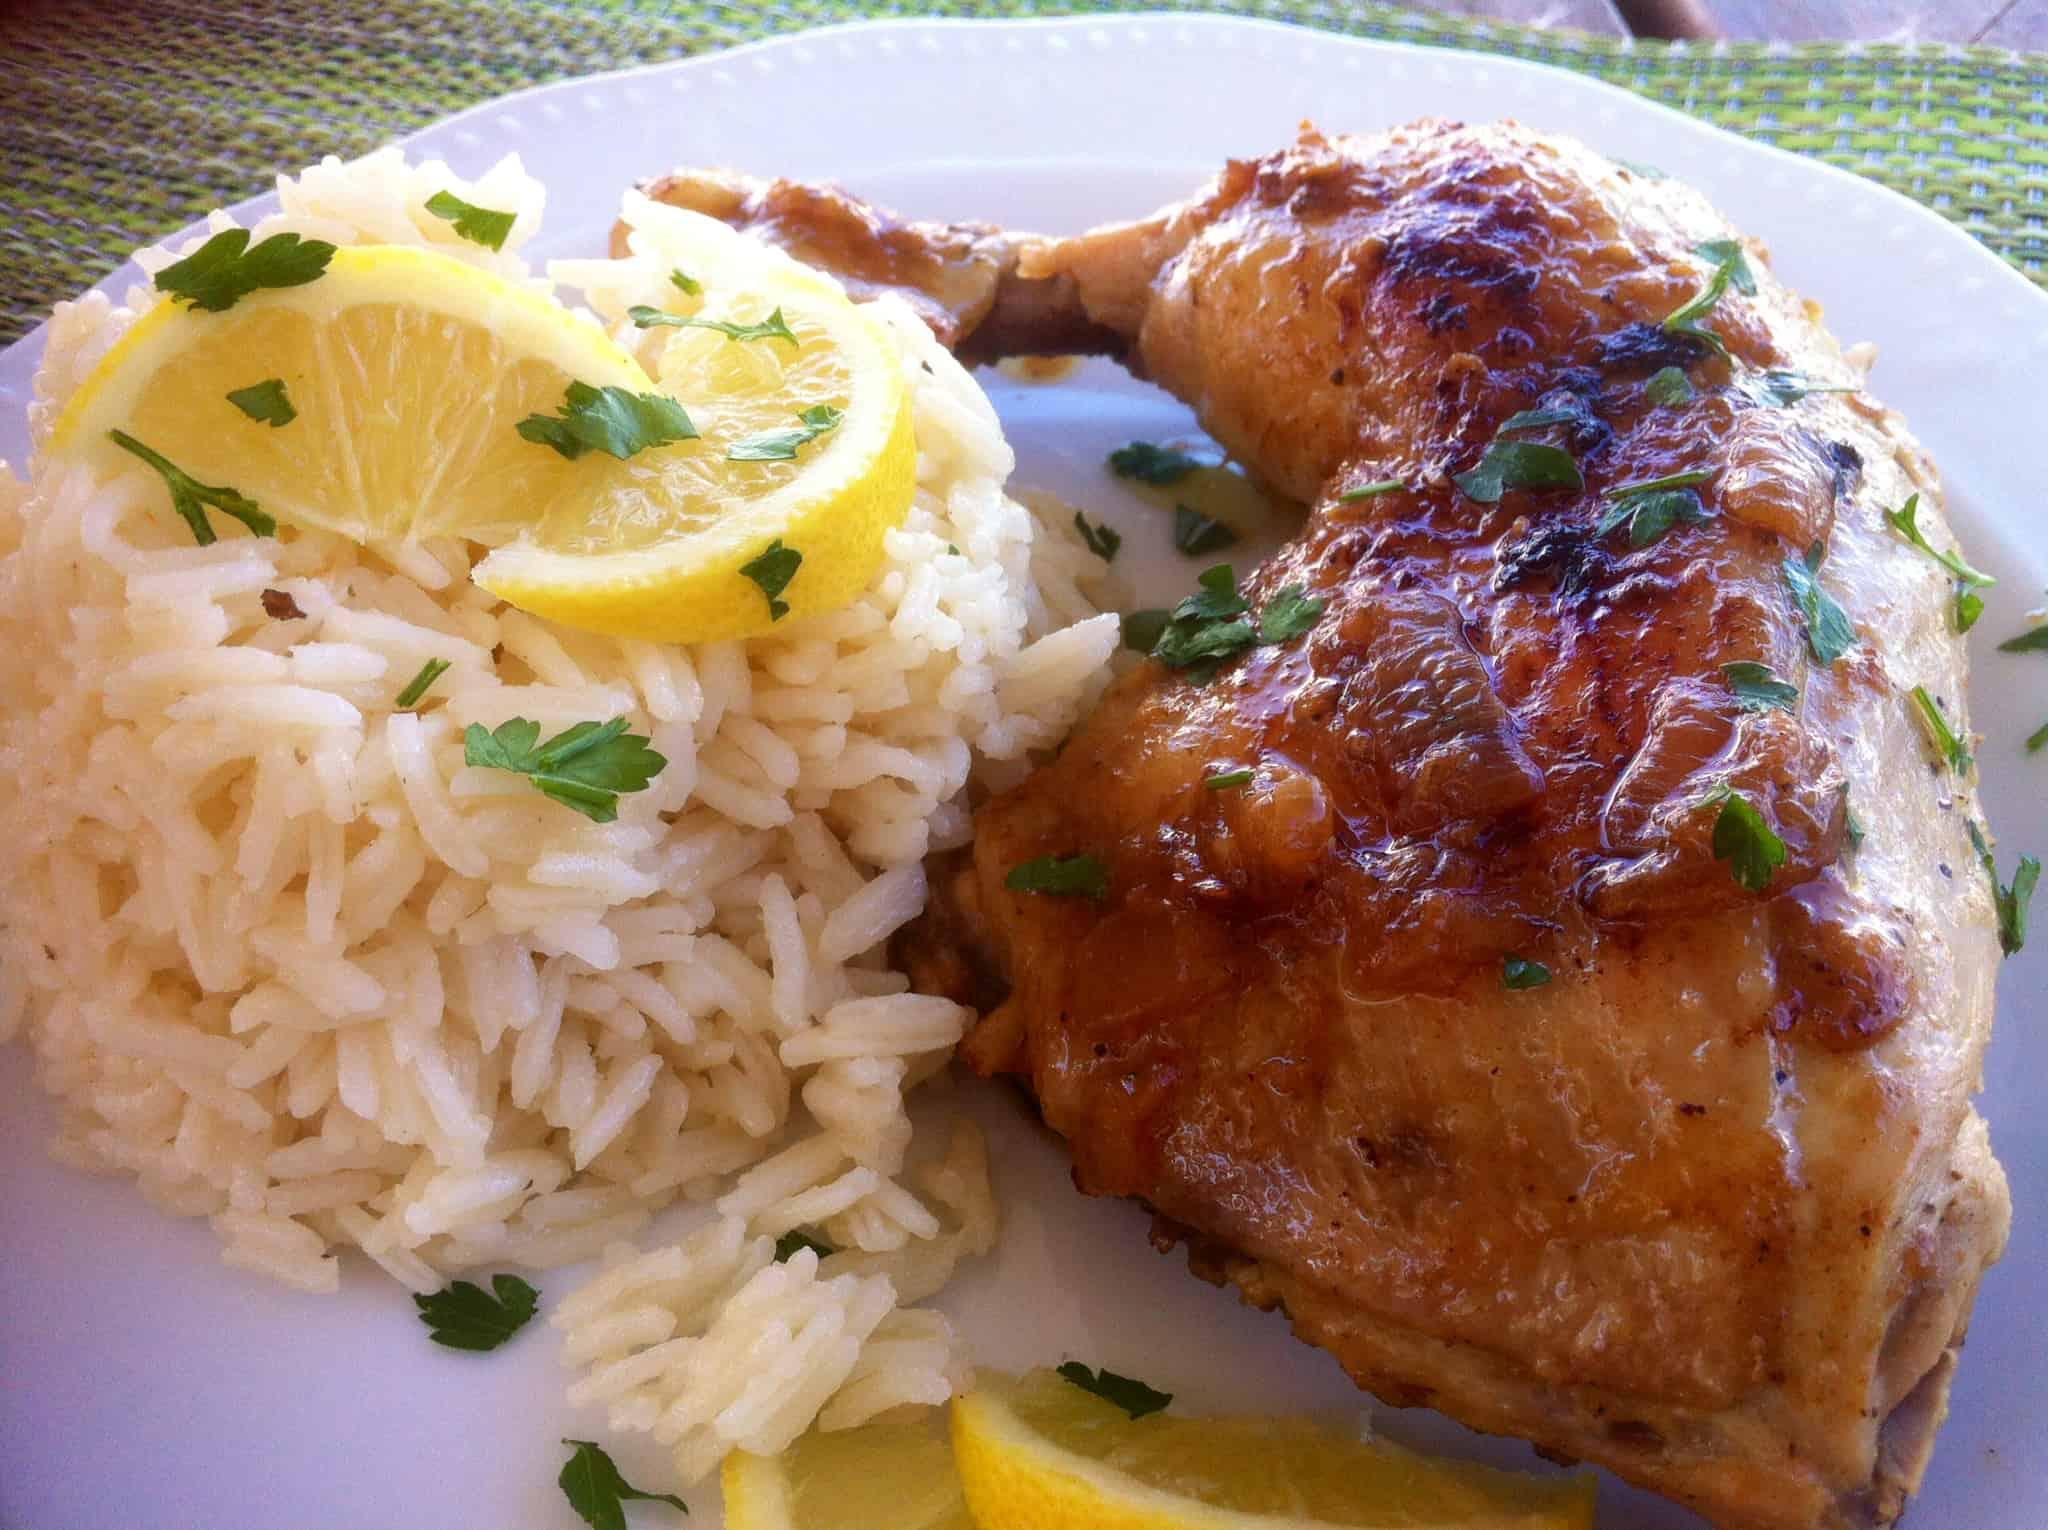 Crispy Greek Chicken Casserole with Creamy Lemon Sauce - My Greek Dish